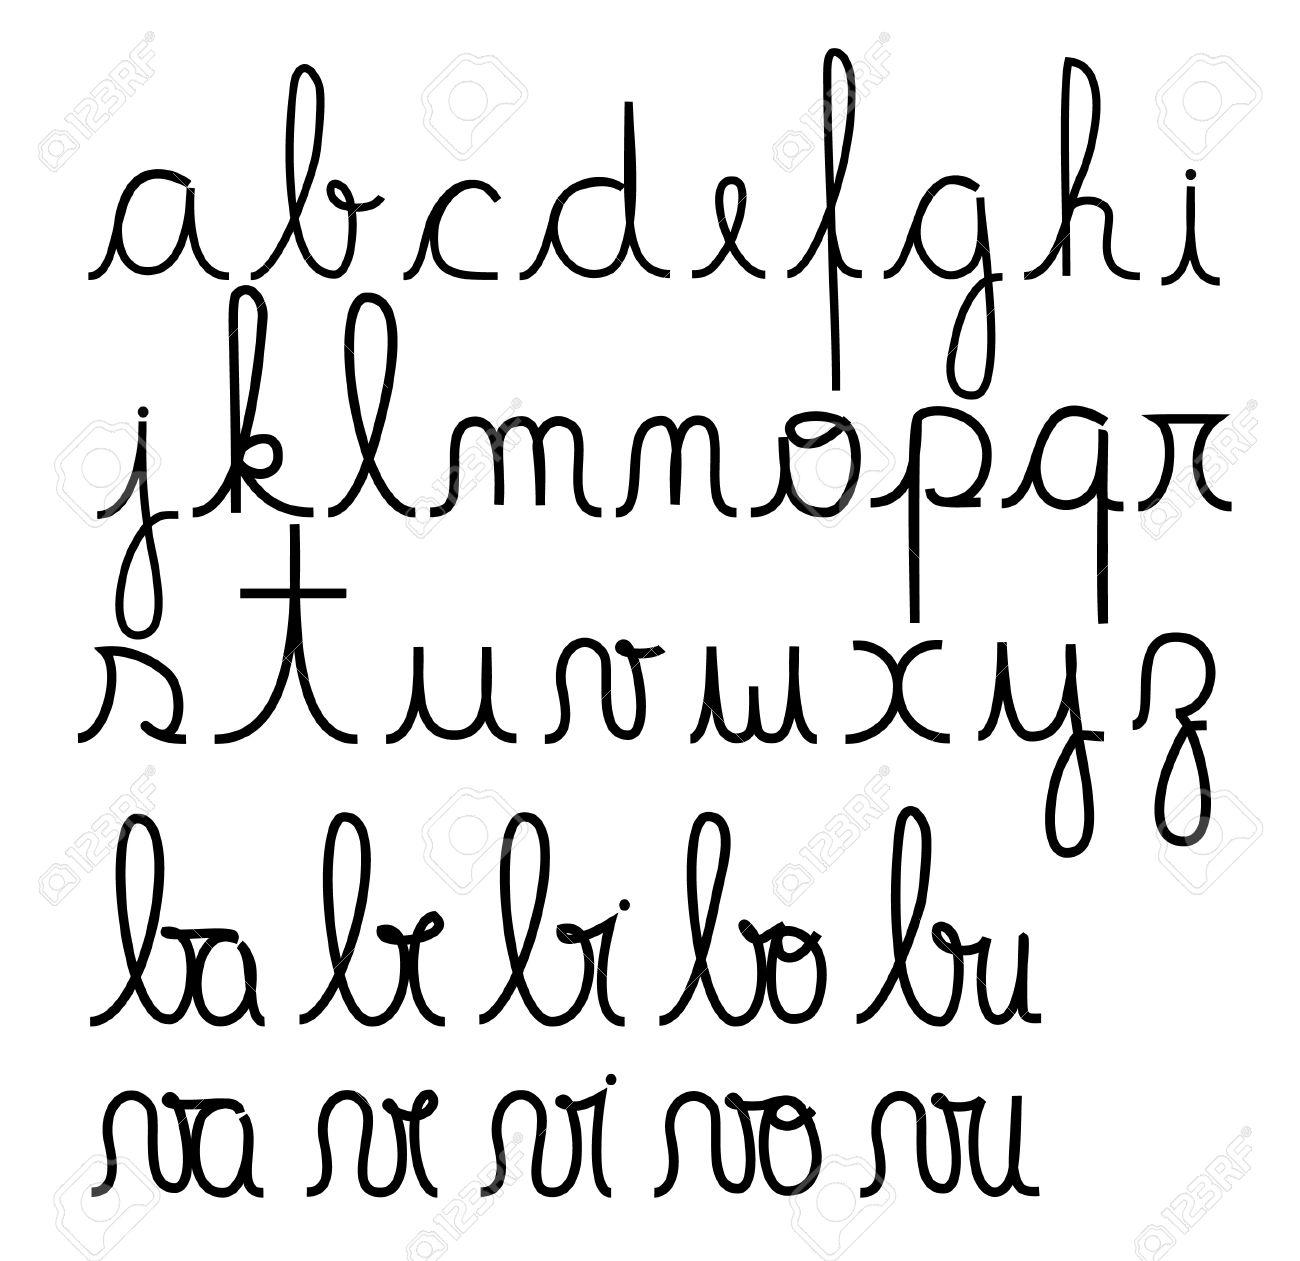 Worksheets Alphabet In Cursive cursive alphabet royalty free cliparts vectors and stock alphabet